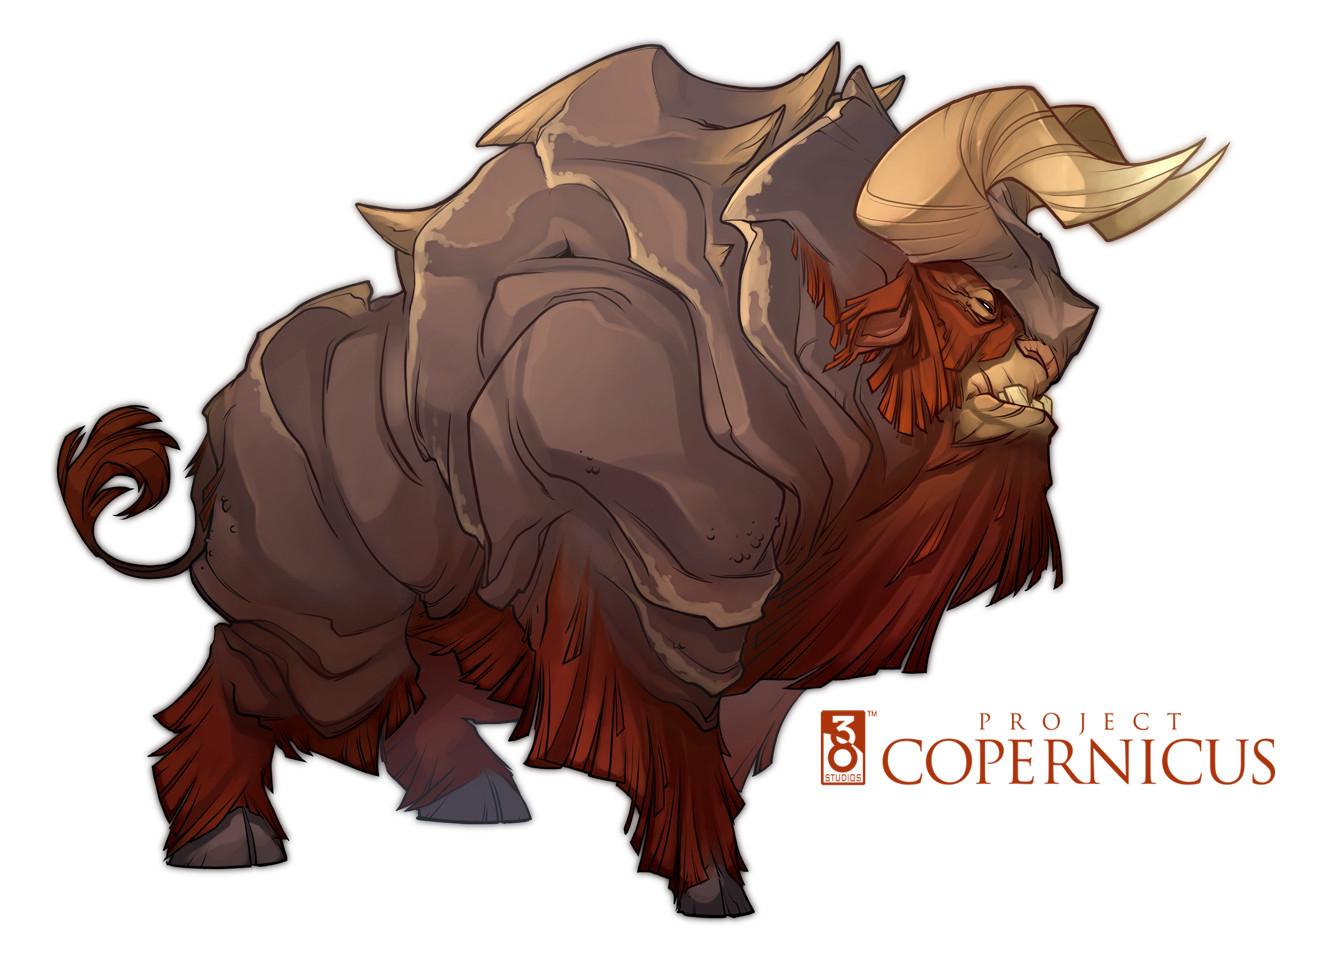 Nicholas kole aurochs